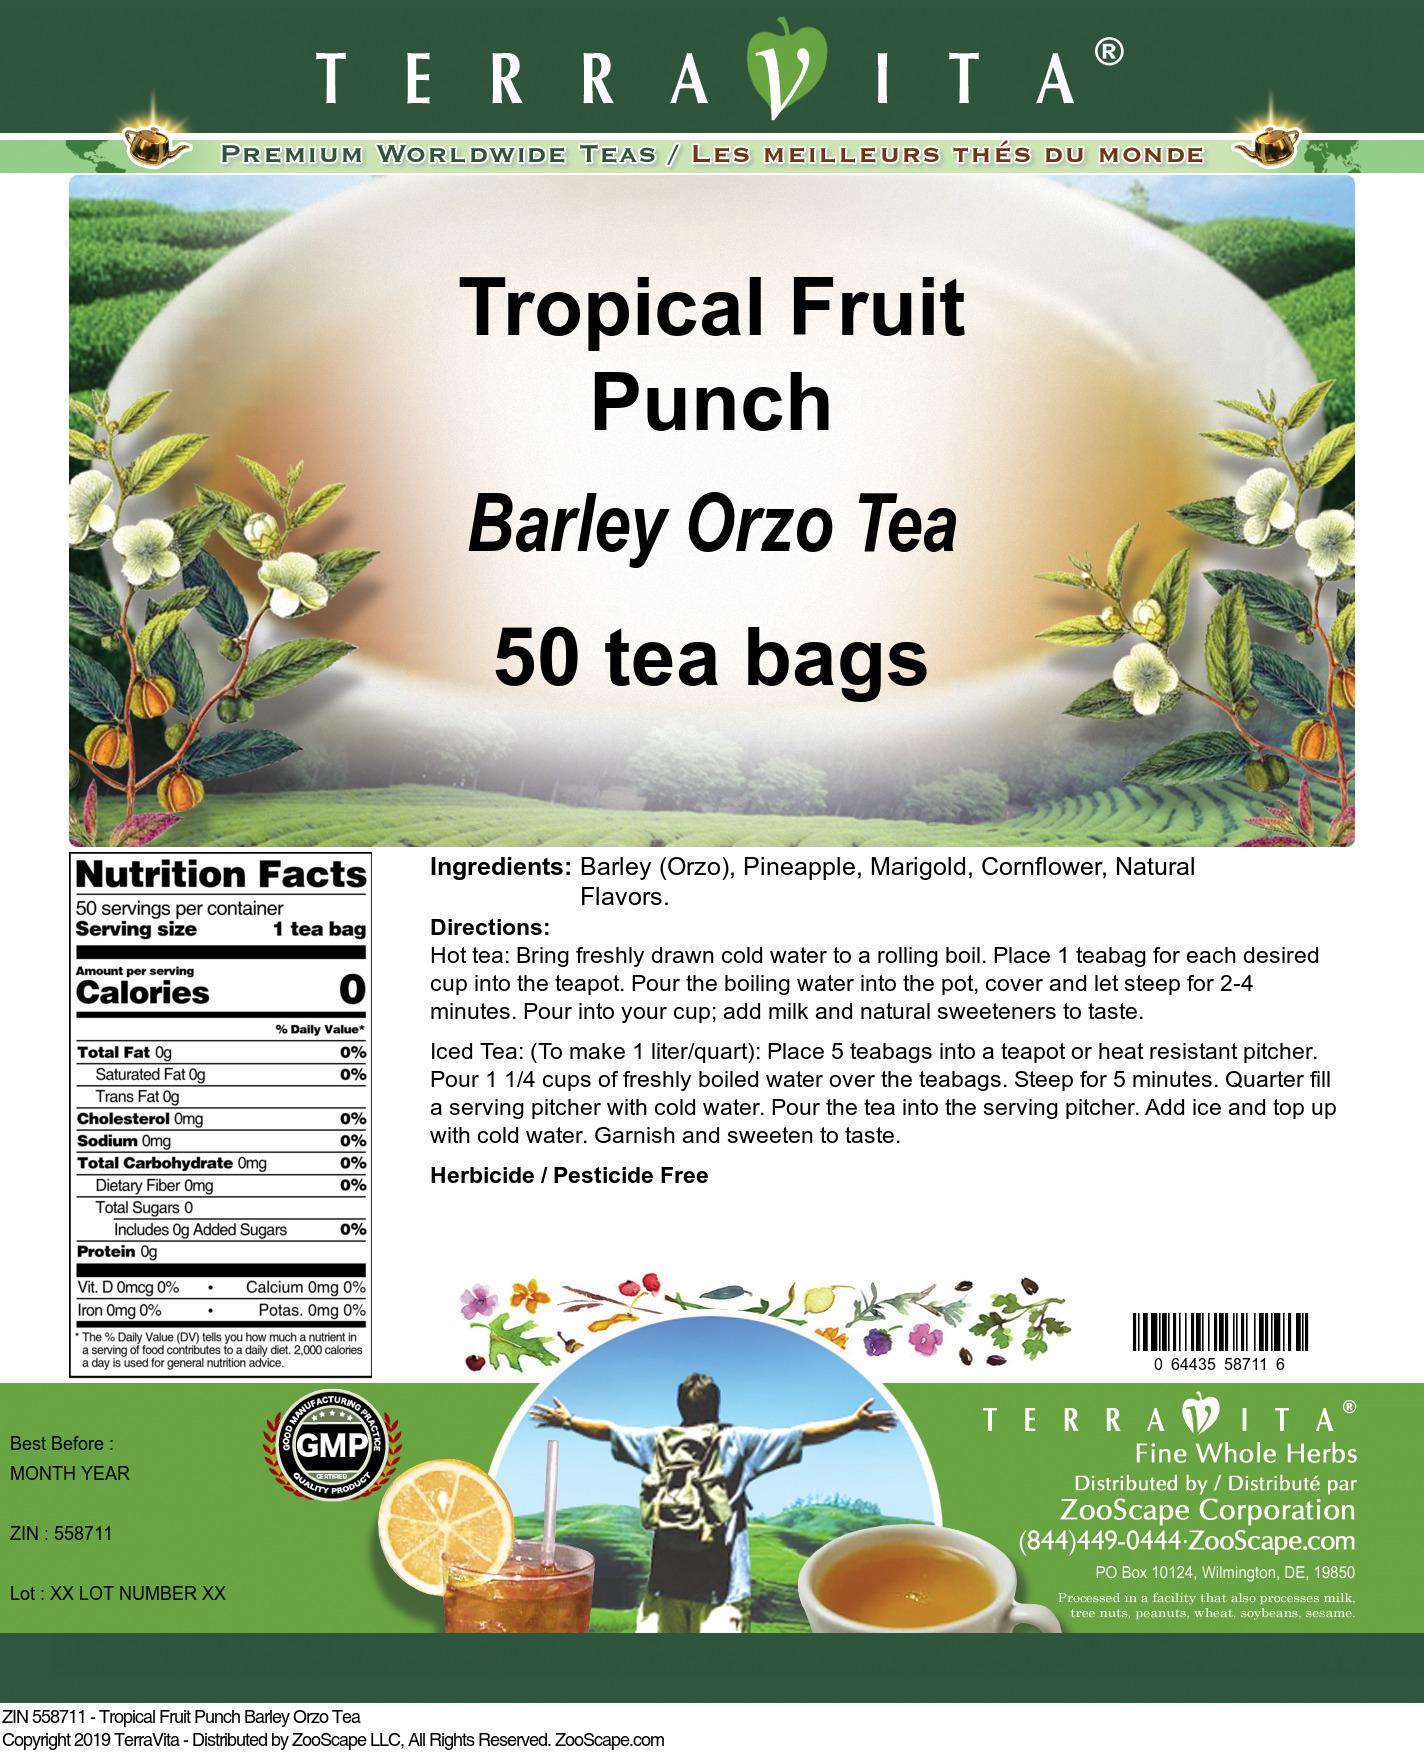 Tropical Fruit Punch Barley Orzo